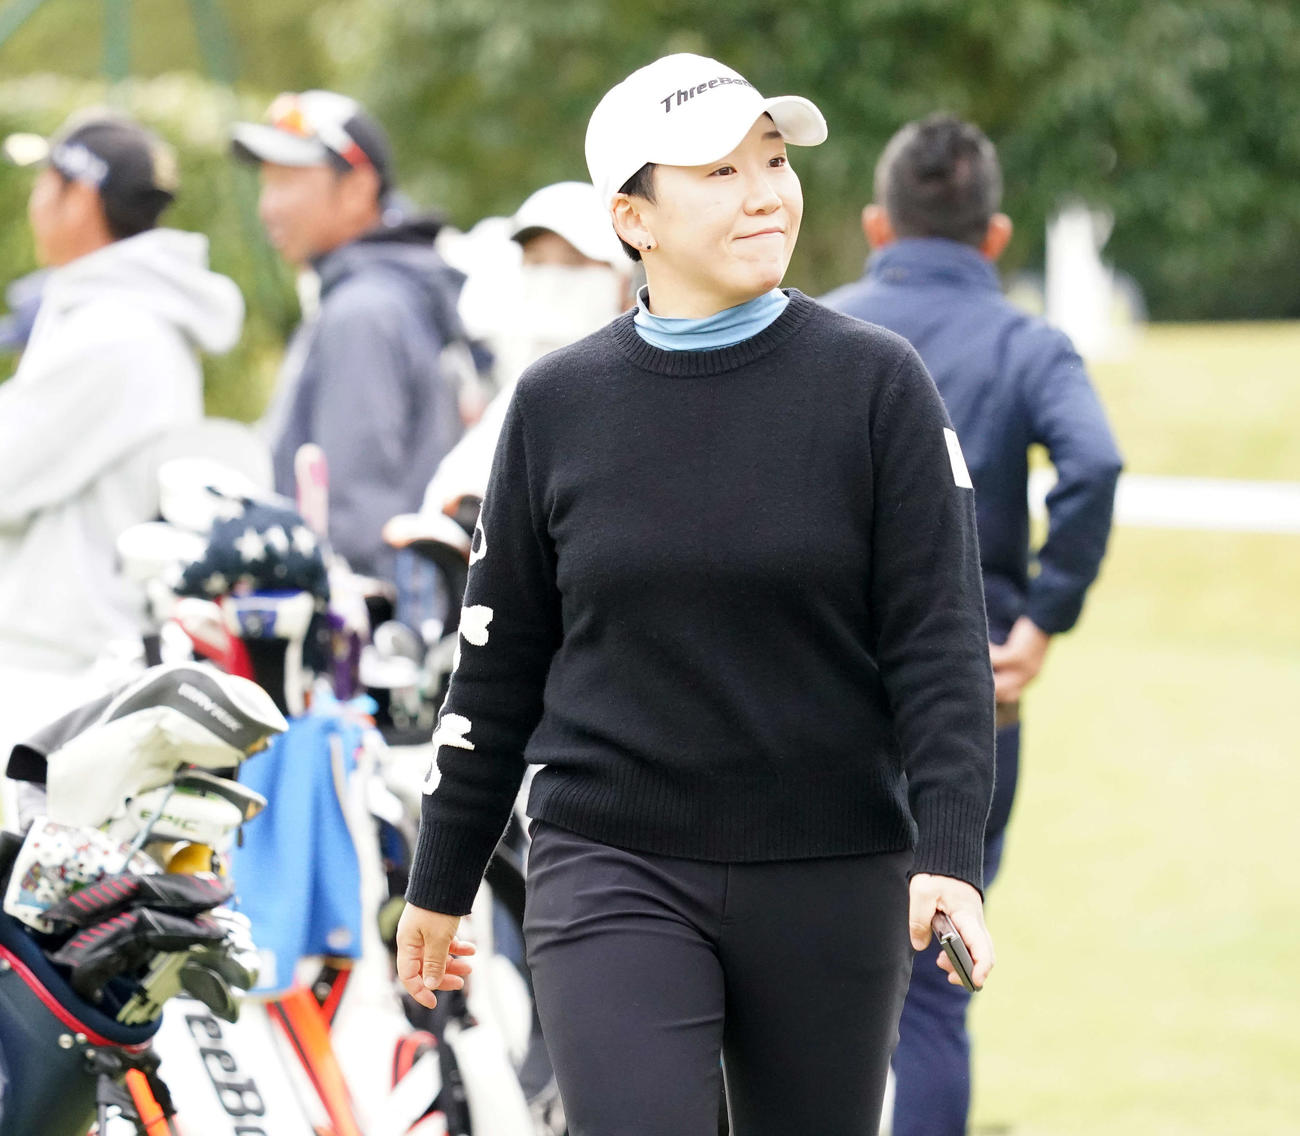 https://www.nikkansports.com/sports/golf/news/img/202011120000270-w1300_24.jpg